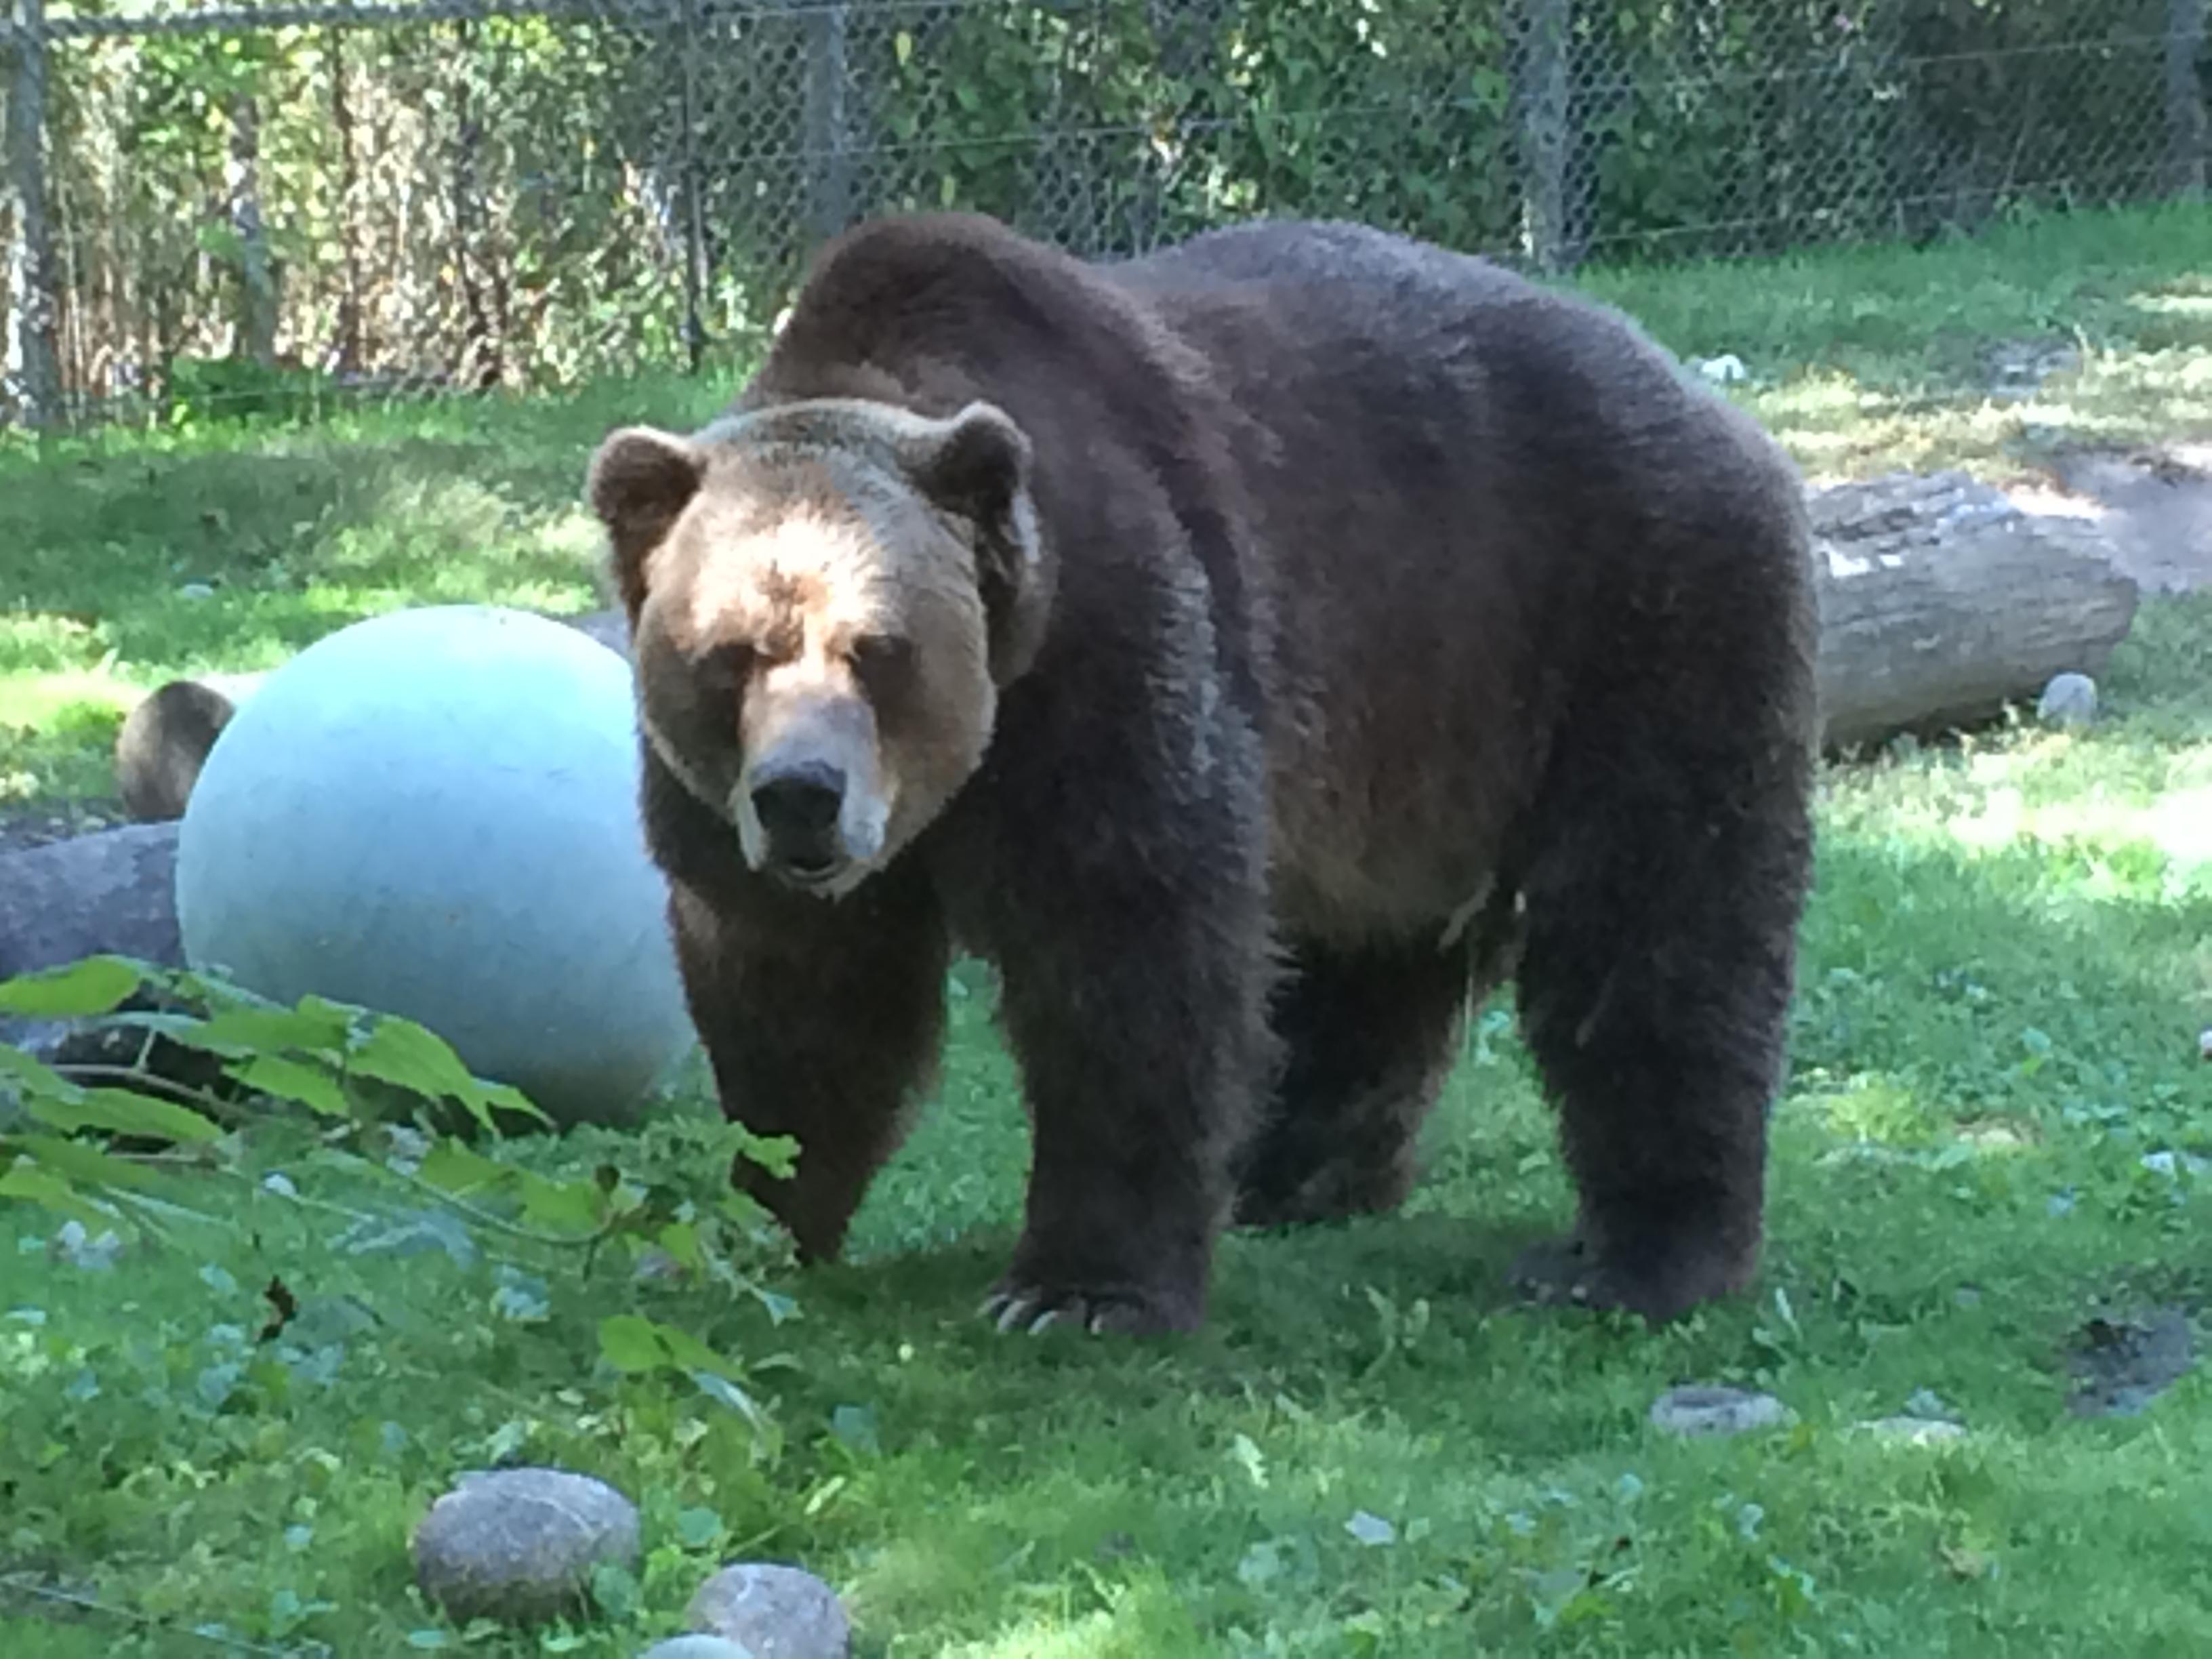 2015-09-24 14.55.40 Toronto Zoo